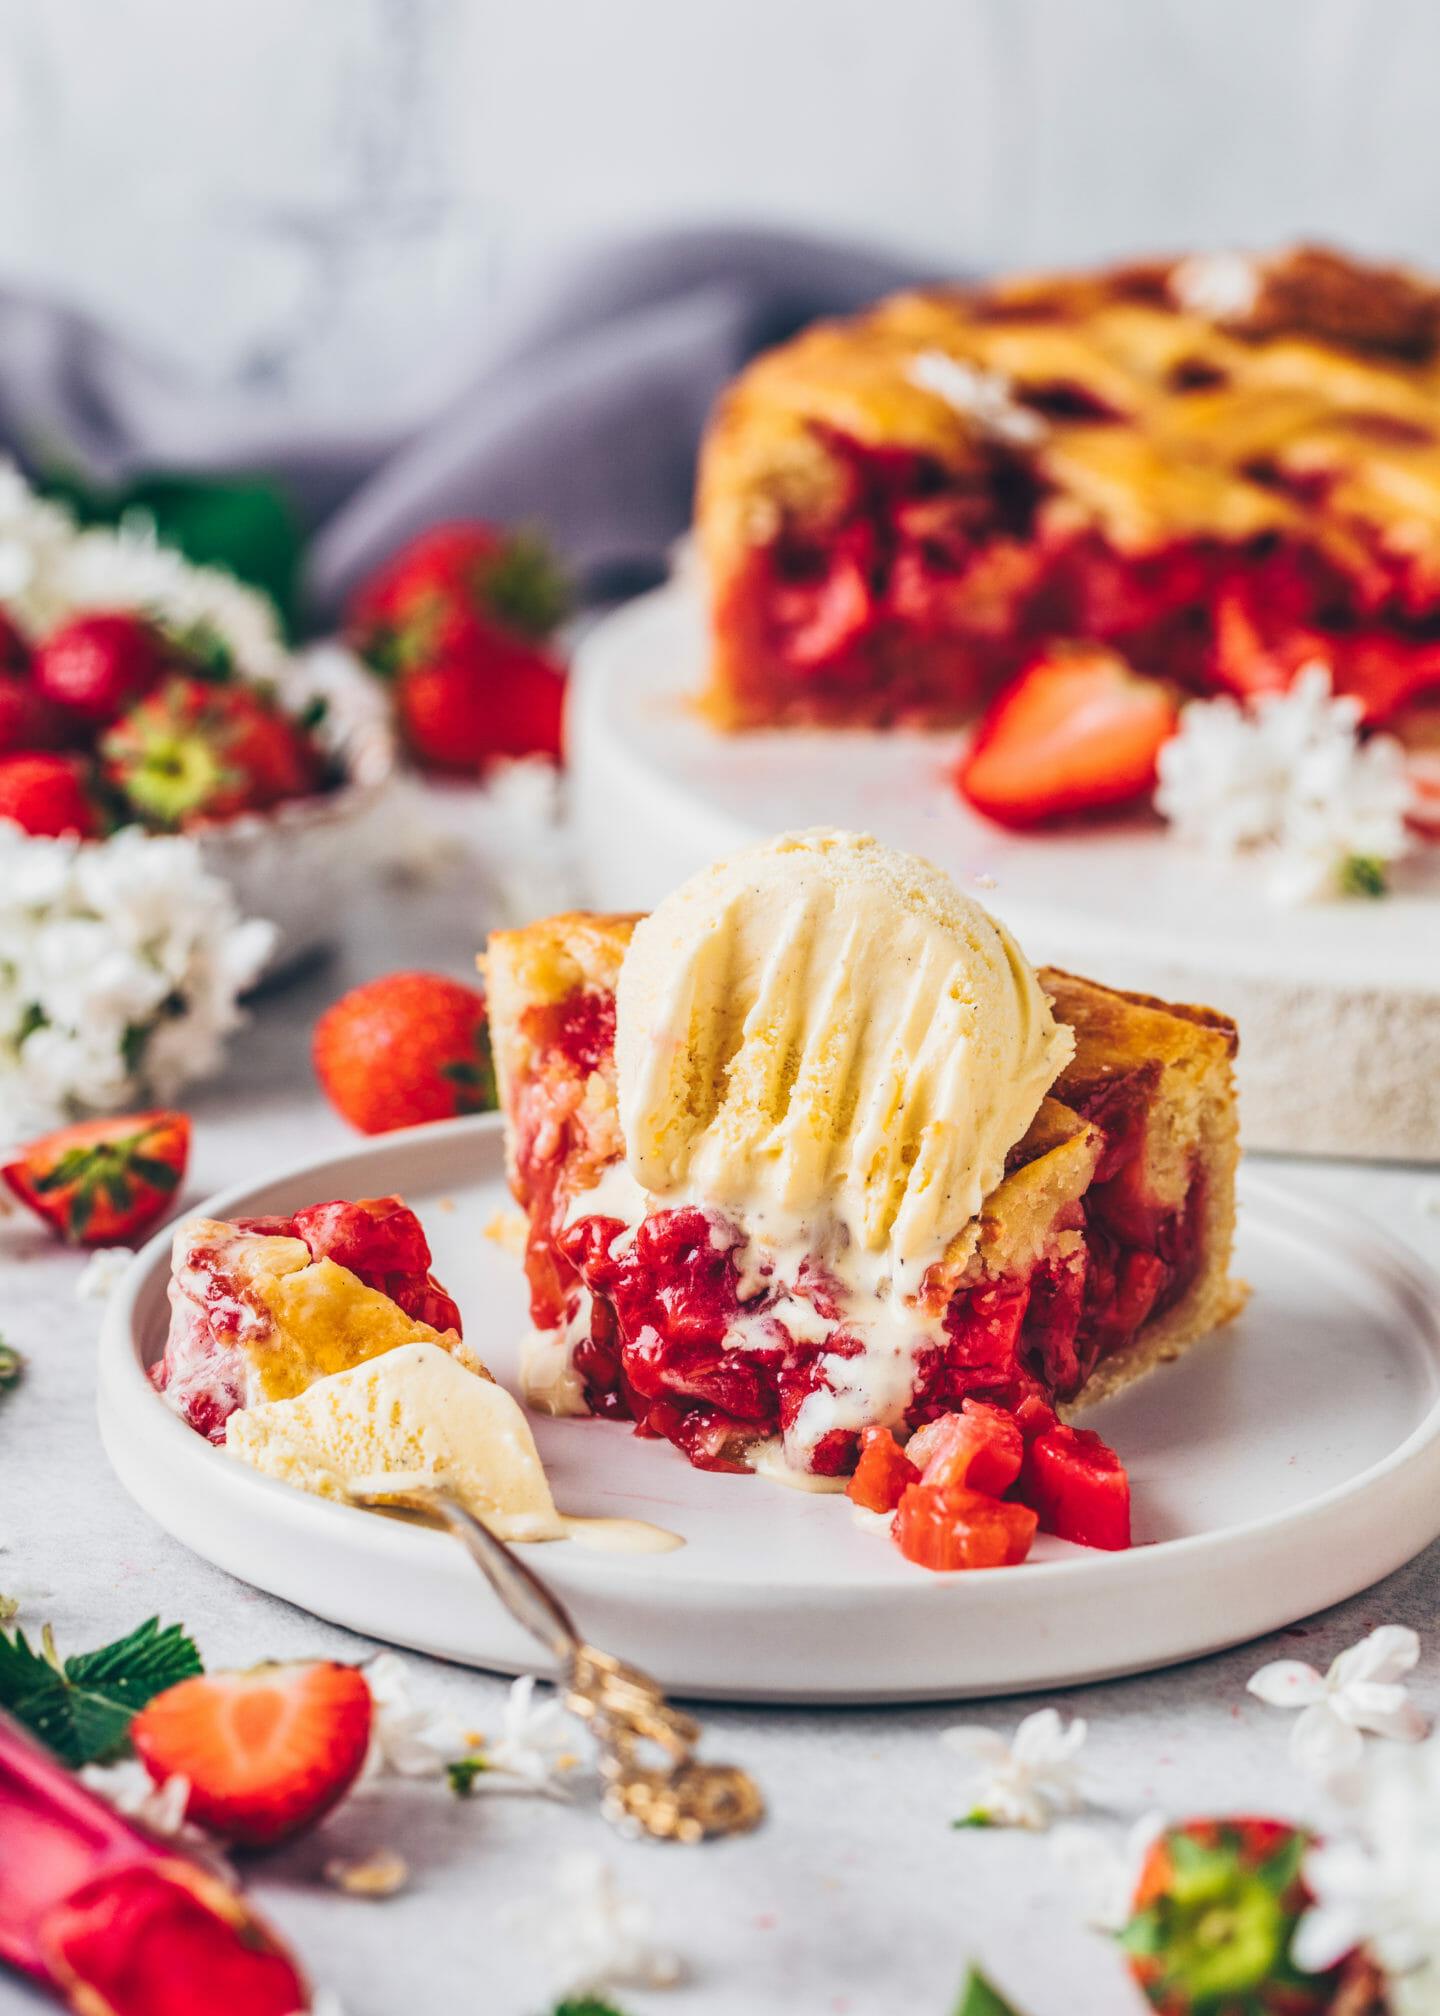 Erdbeeren Rhabarber Pie mit Vanille-Eis